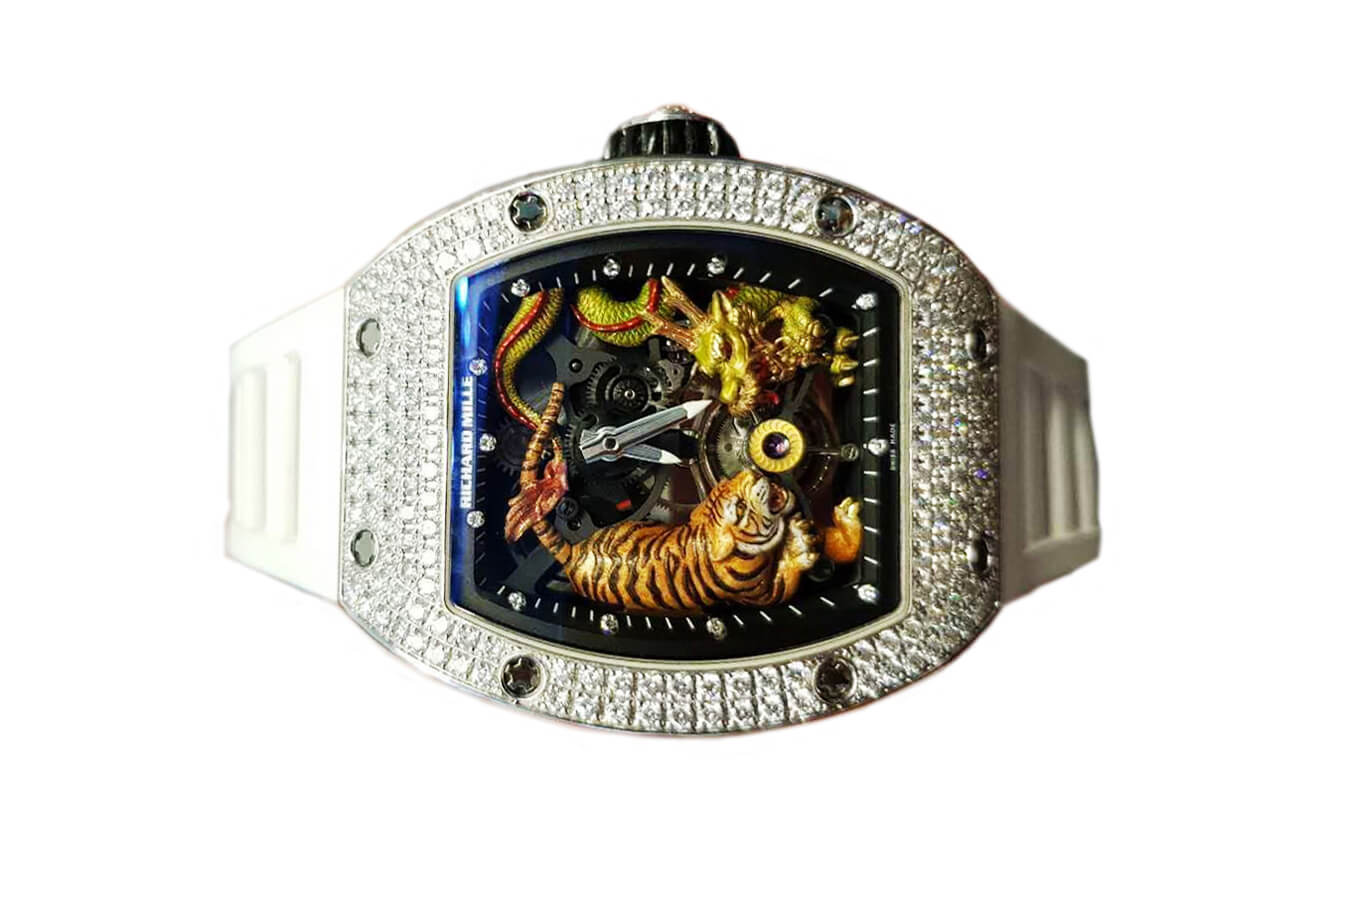 Đồng hồ Richard Mille RM 51-01 Tourbillon Tiger and Dragon - Michelle Yeoh